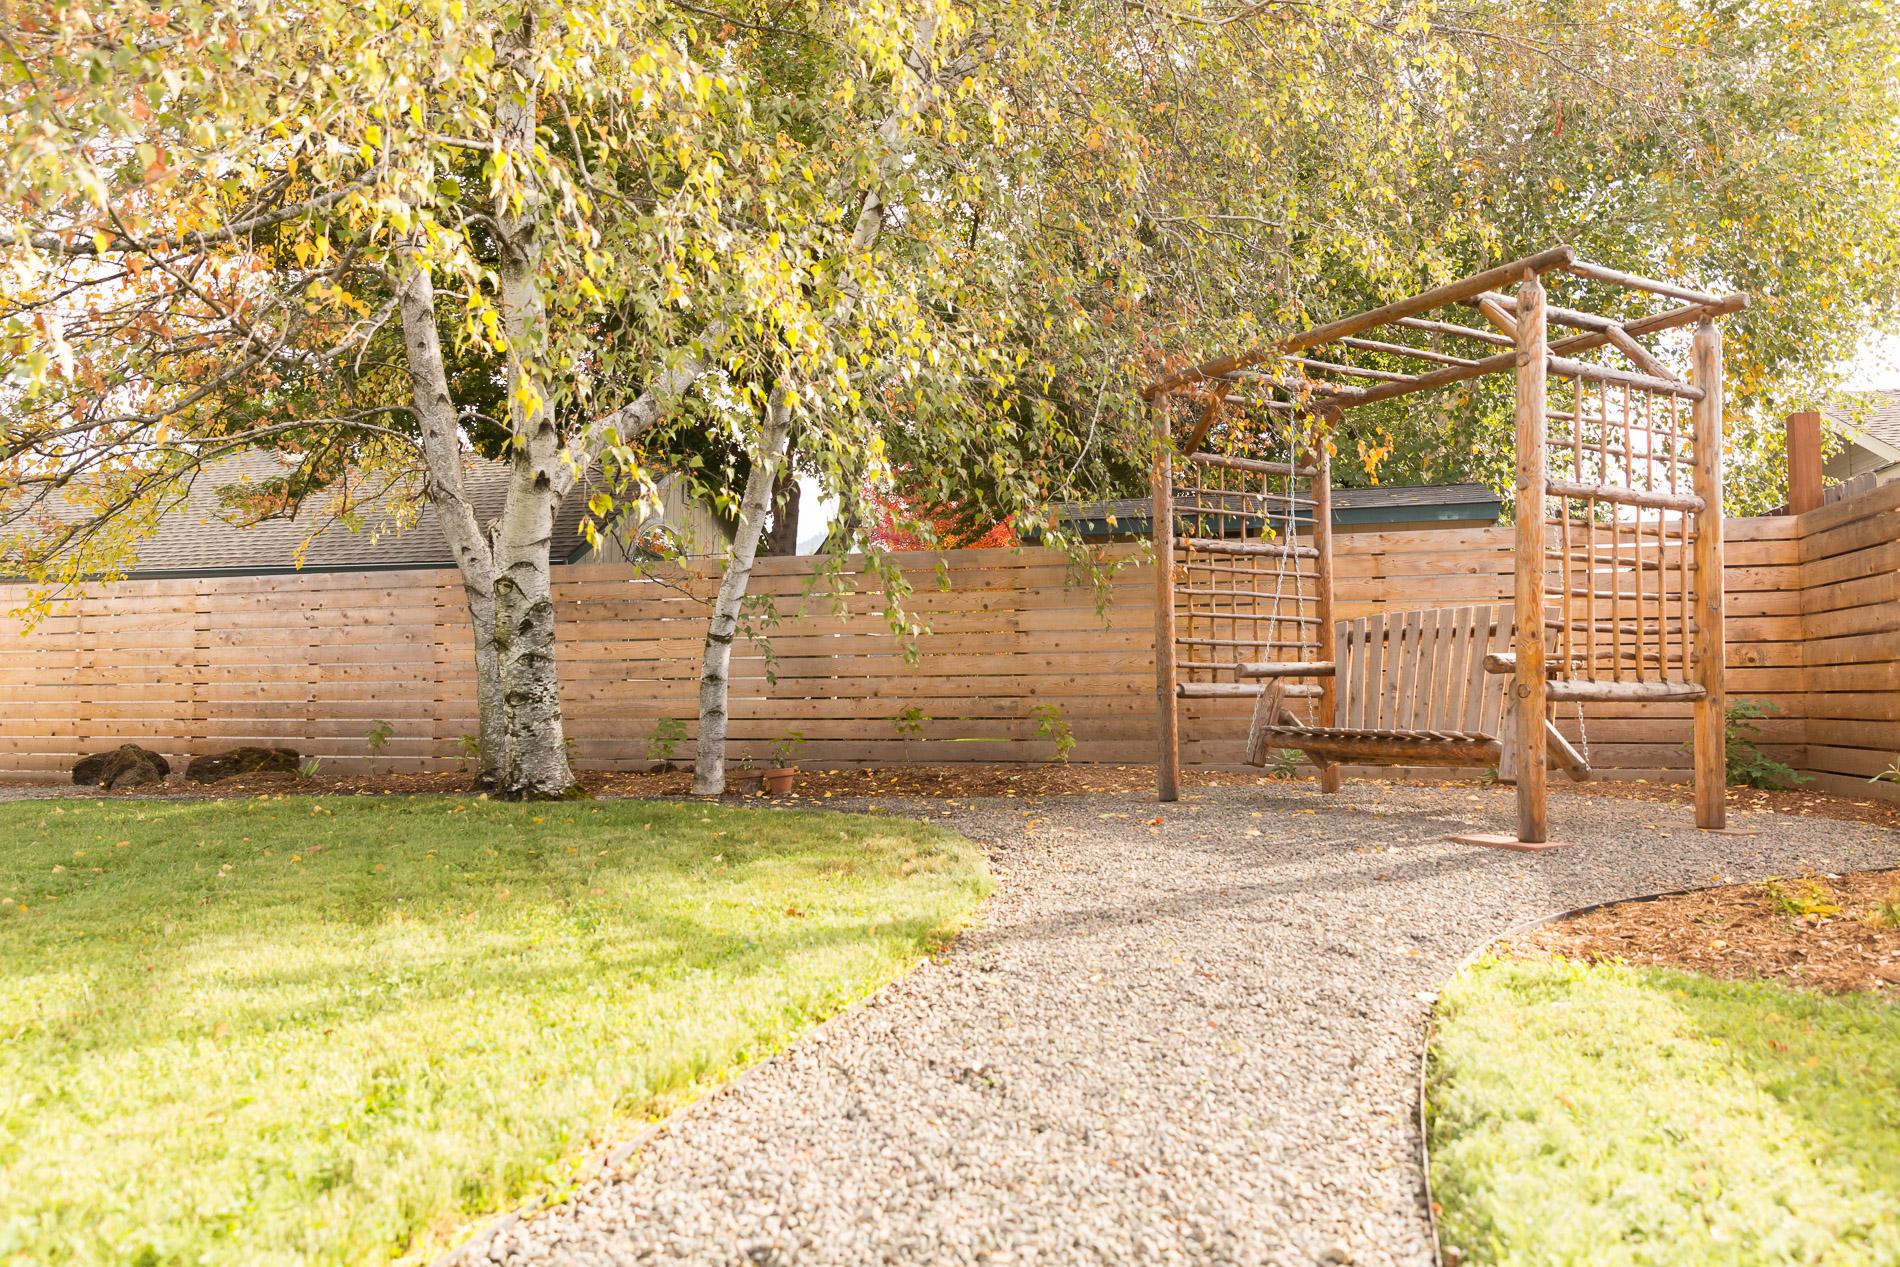 Backyard Swing + Eco-Lawn + Gravel Pathways